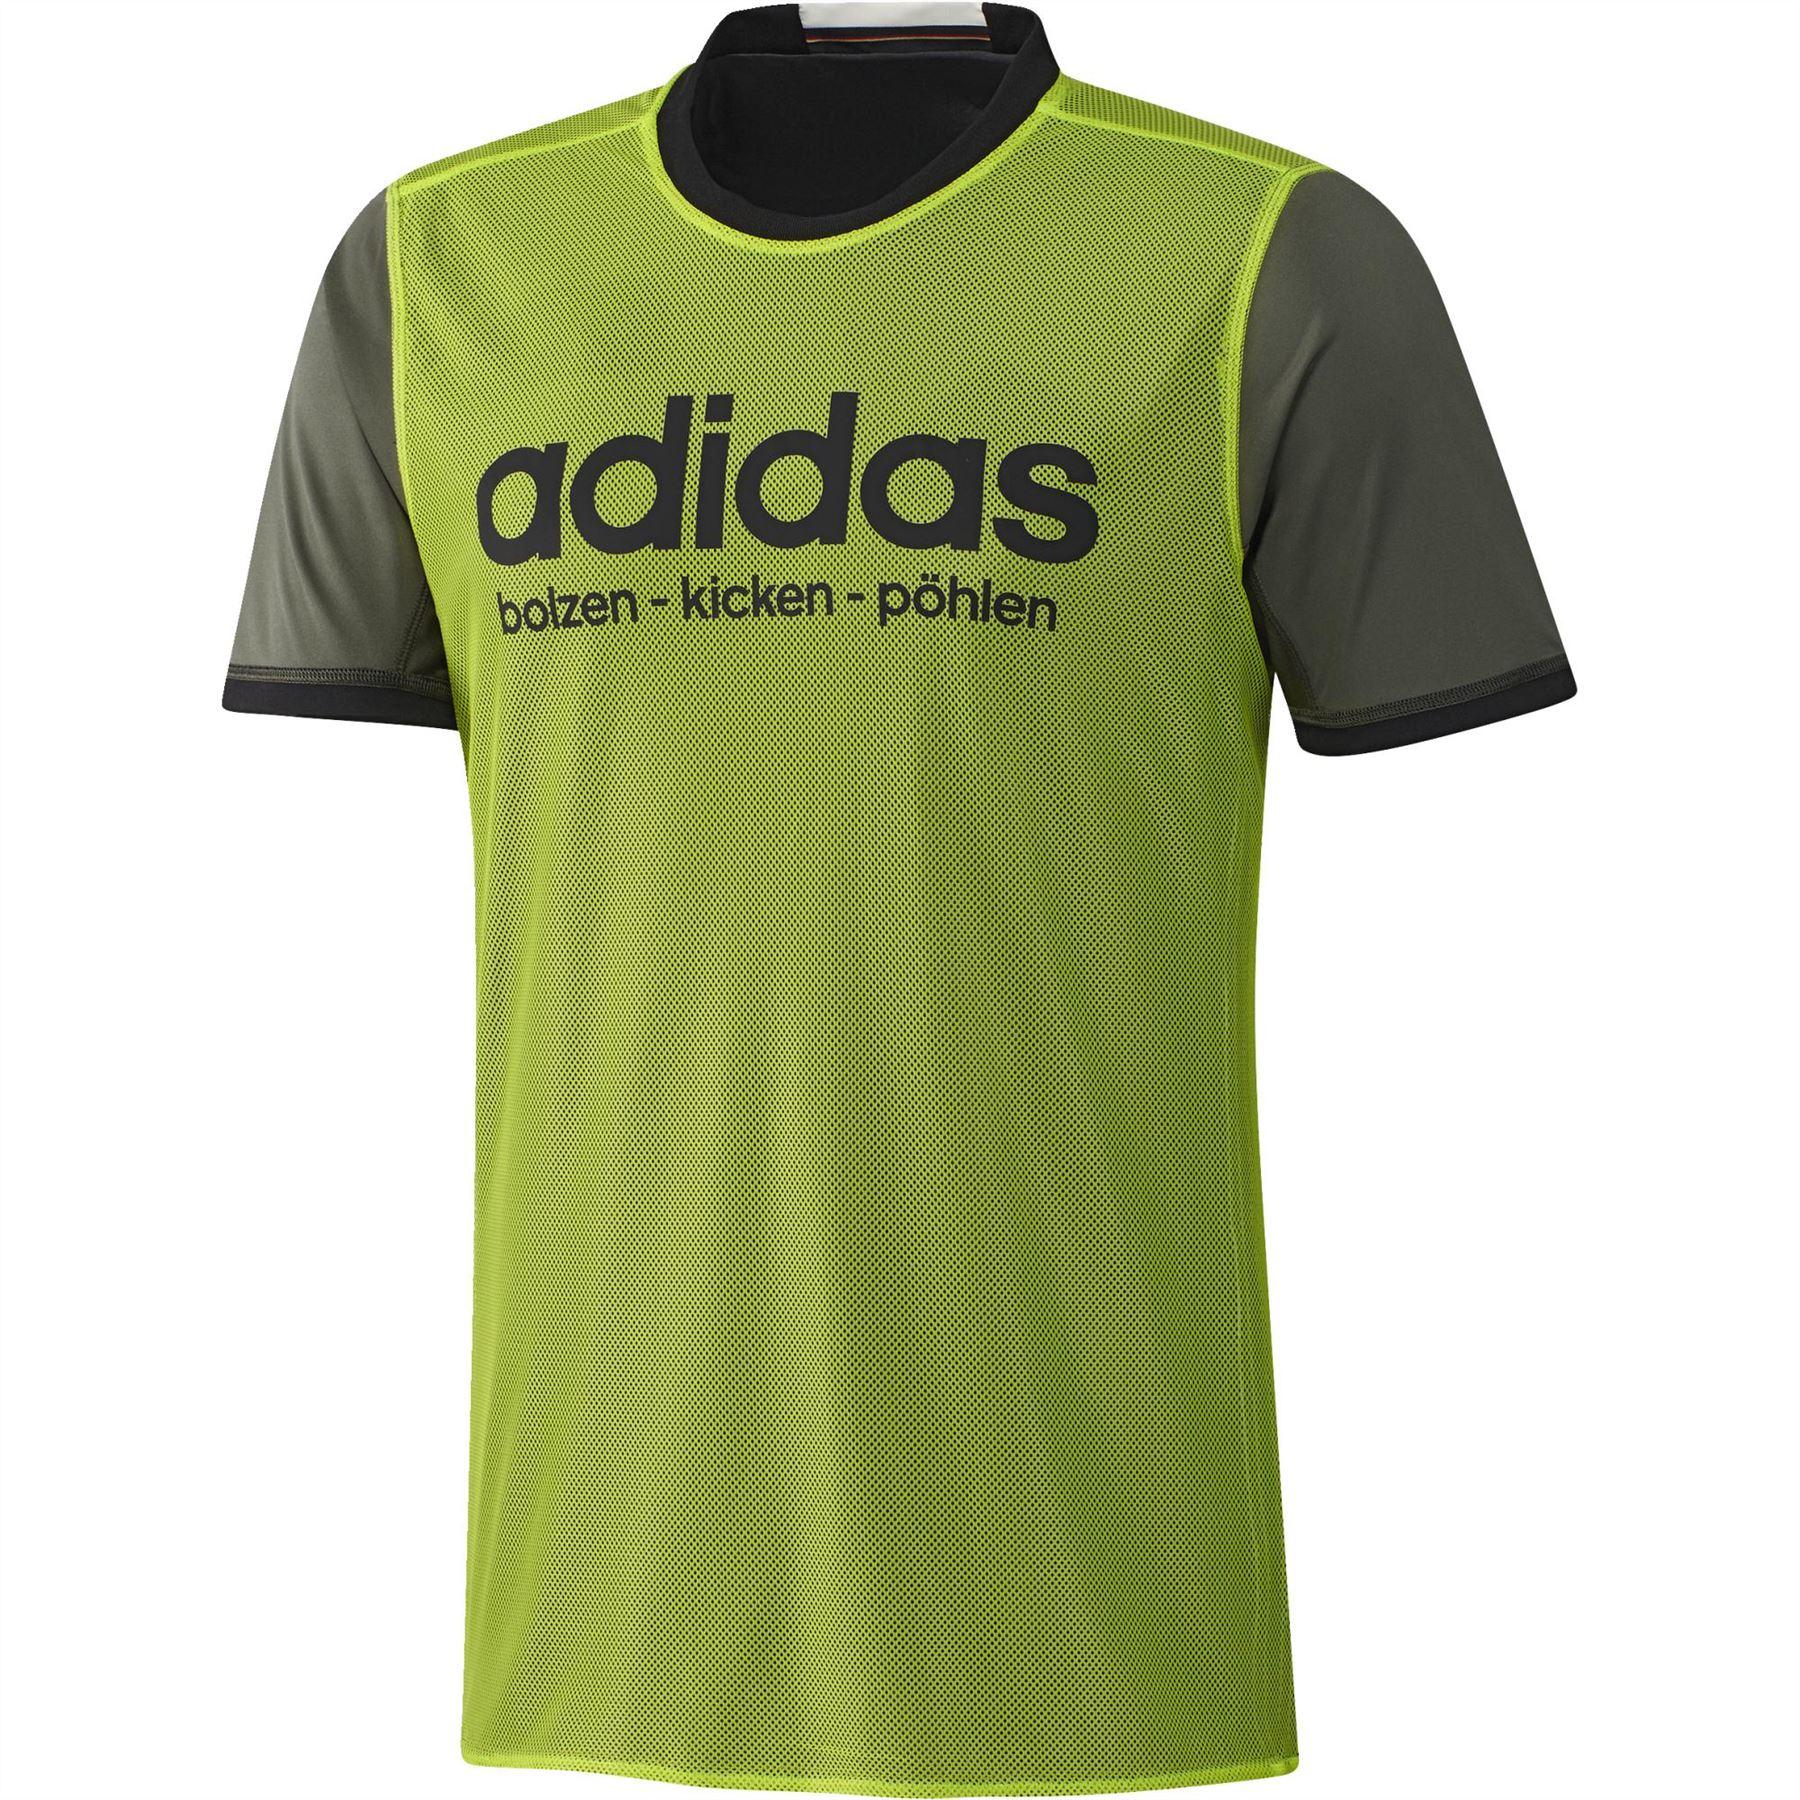 08ee0a415bd adidas Germany Away Jersey 2016 2017 Mens Grey Football Soccer Shirt ...